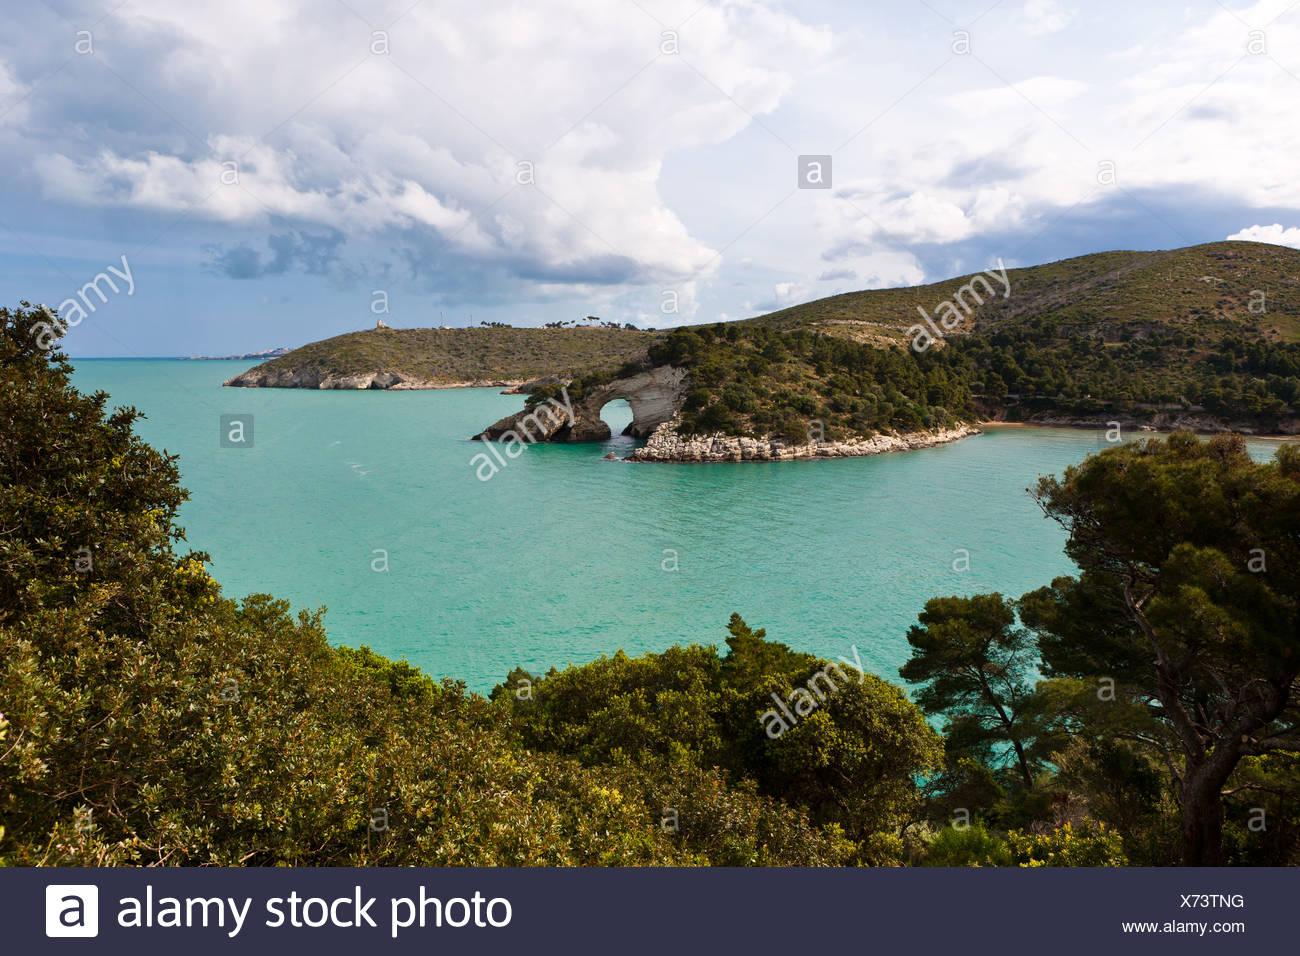 Coast near Gargano, Architello San Felice, also known as the spur of the Italian boot, Foggia Province, Apulia, Puglia, Gargano - Stock Image